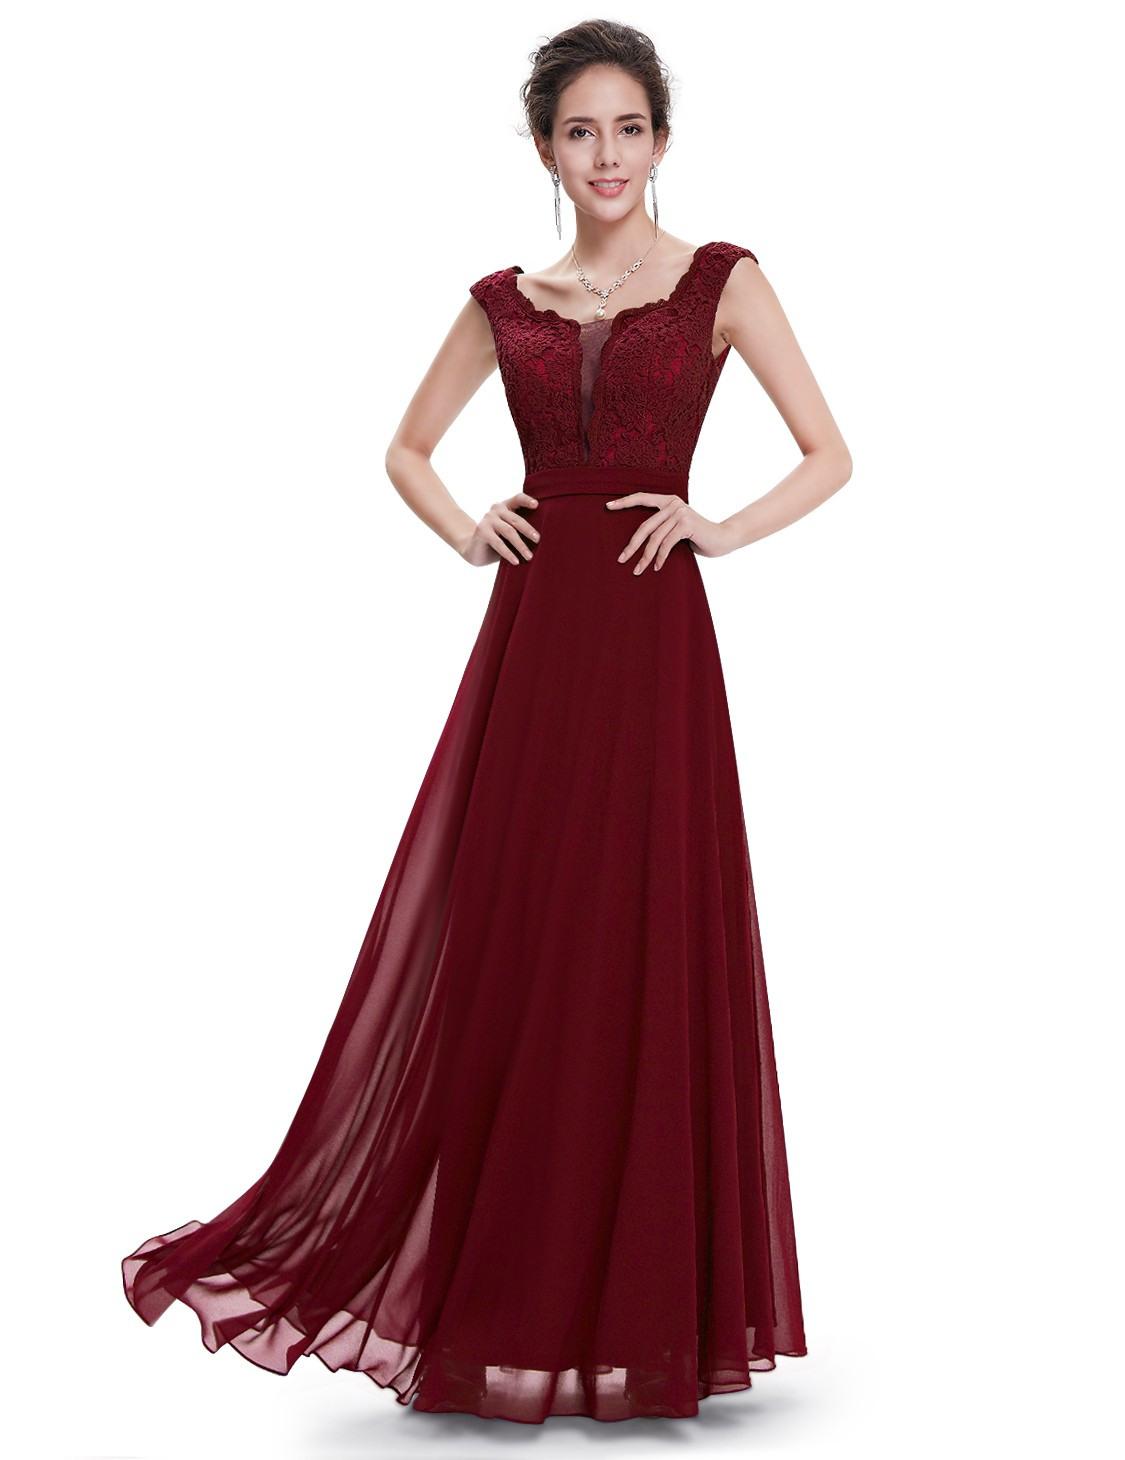 Abend Elegant Abendkleid Mit Träger Stylish17 Coolste Abendkleid Mit Träger Design